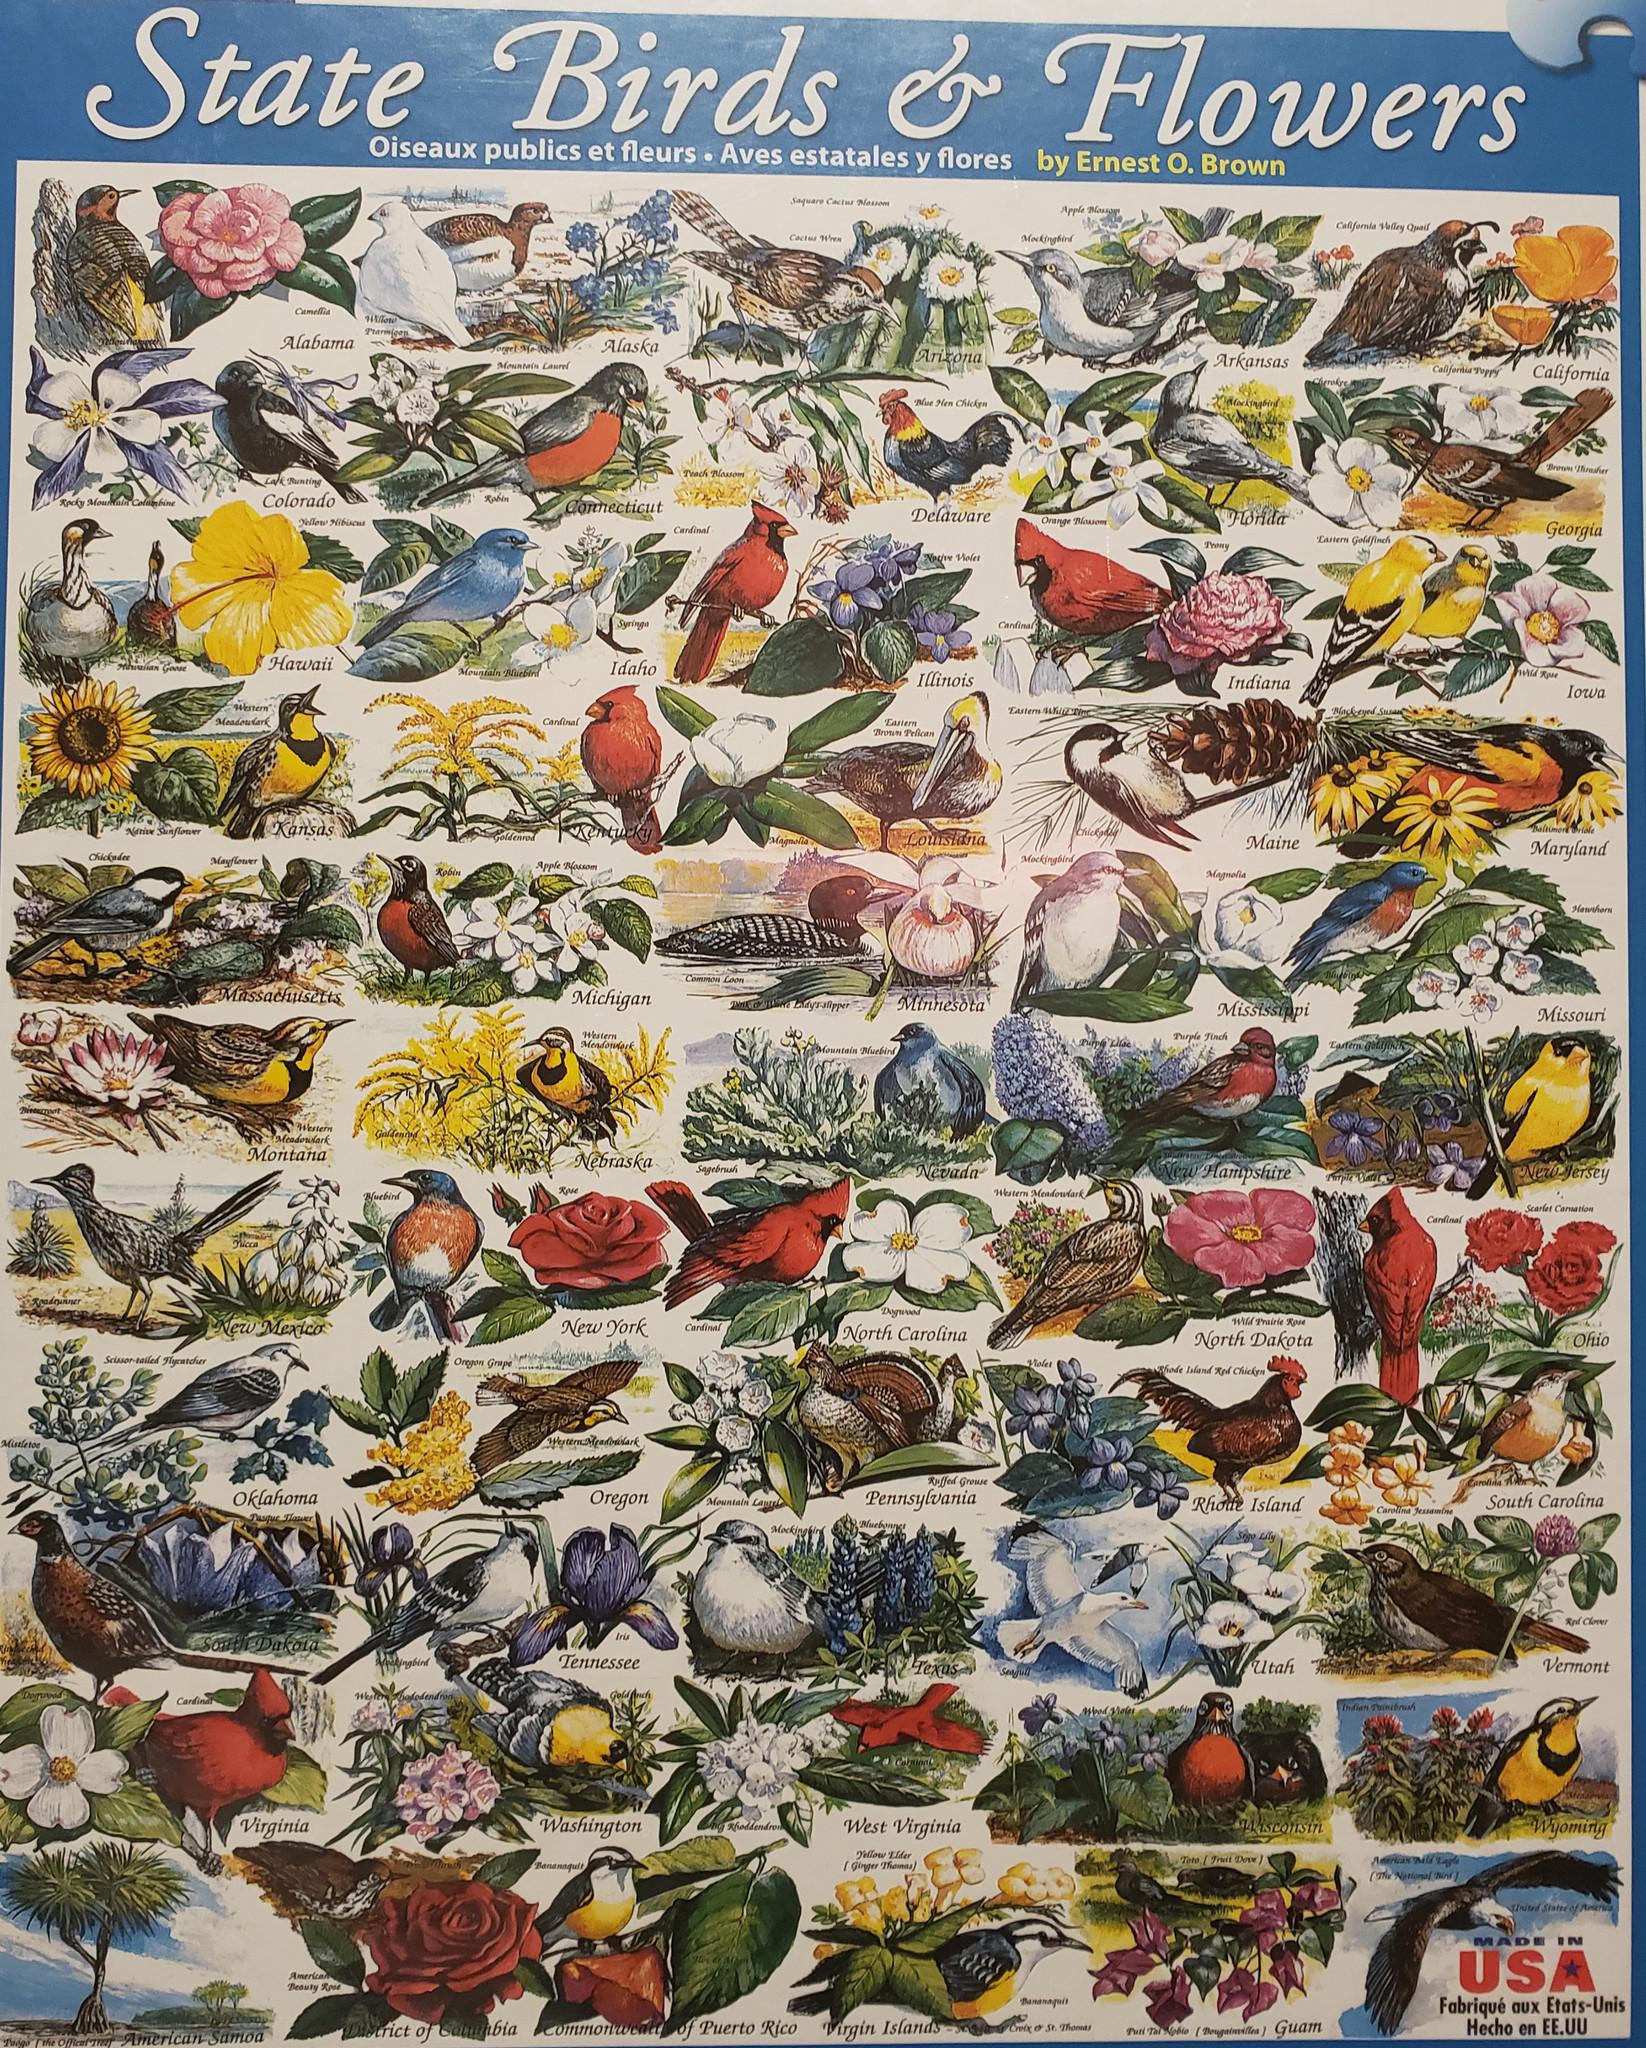 State Birds & Flowers